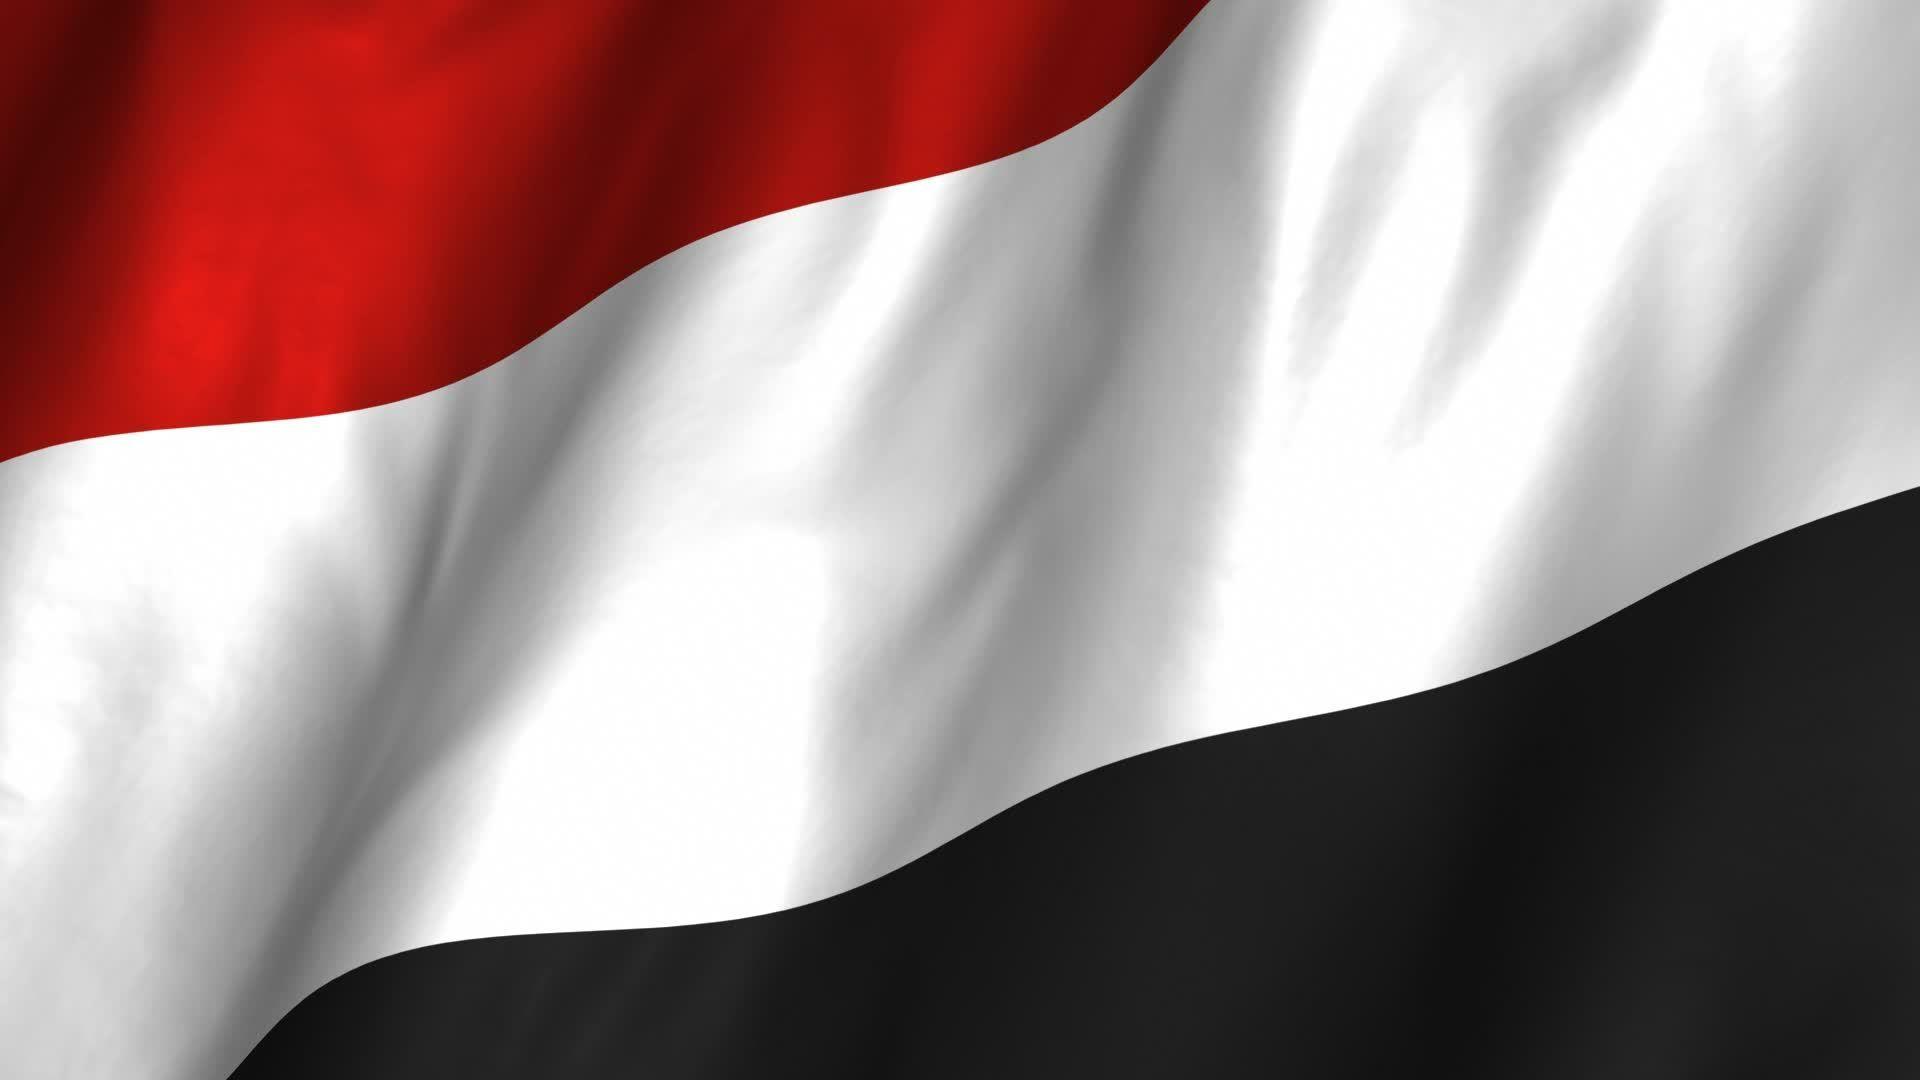 Yemen Flag Wallpaper   MixHD wallpapers Newspaper Articles101 1920x1080